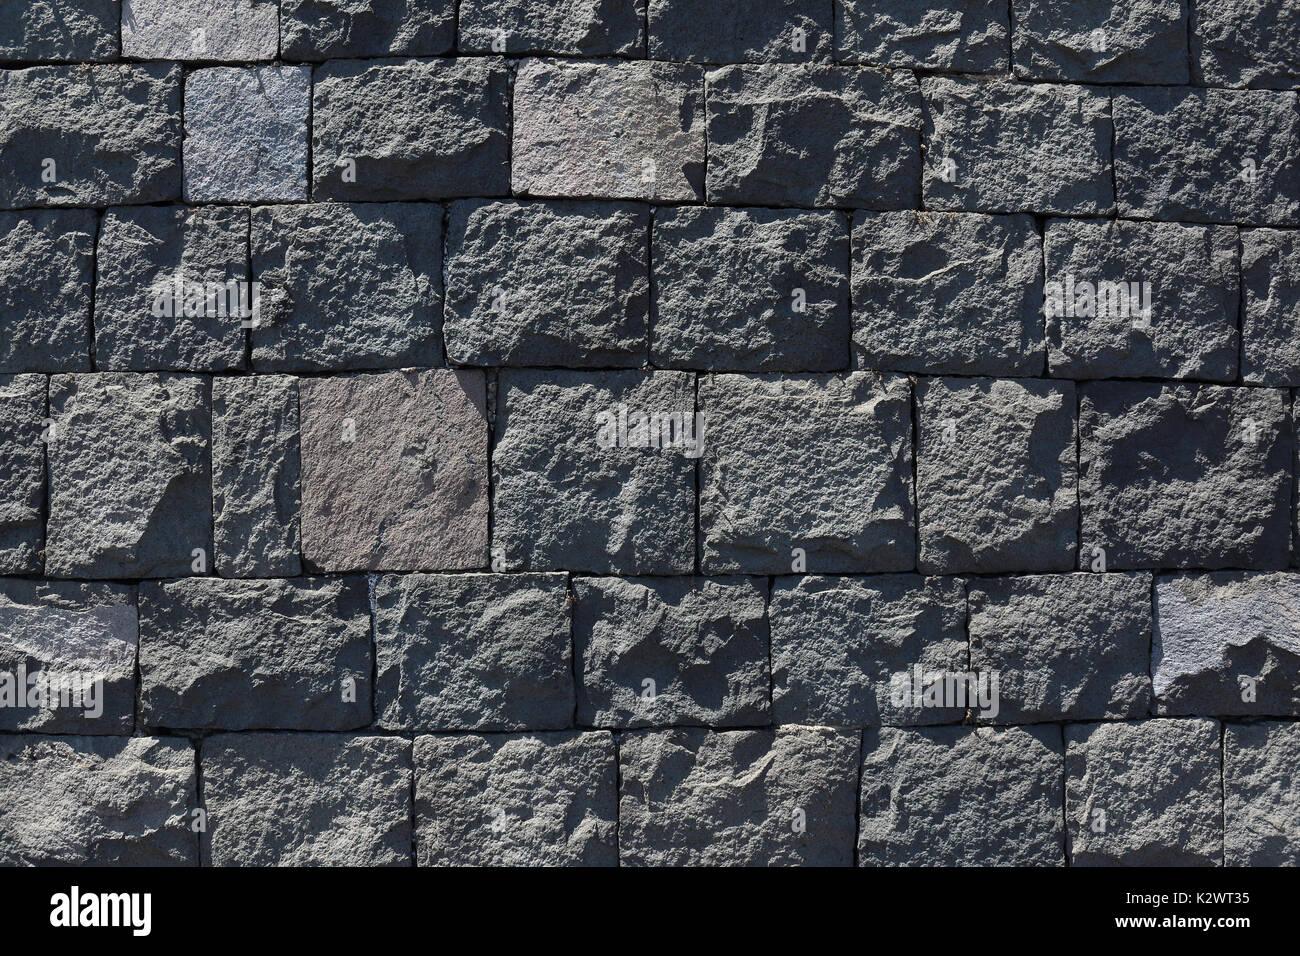 Basalt Stone Wall : Basalt blocks stock photos images